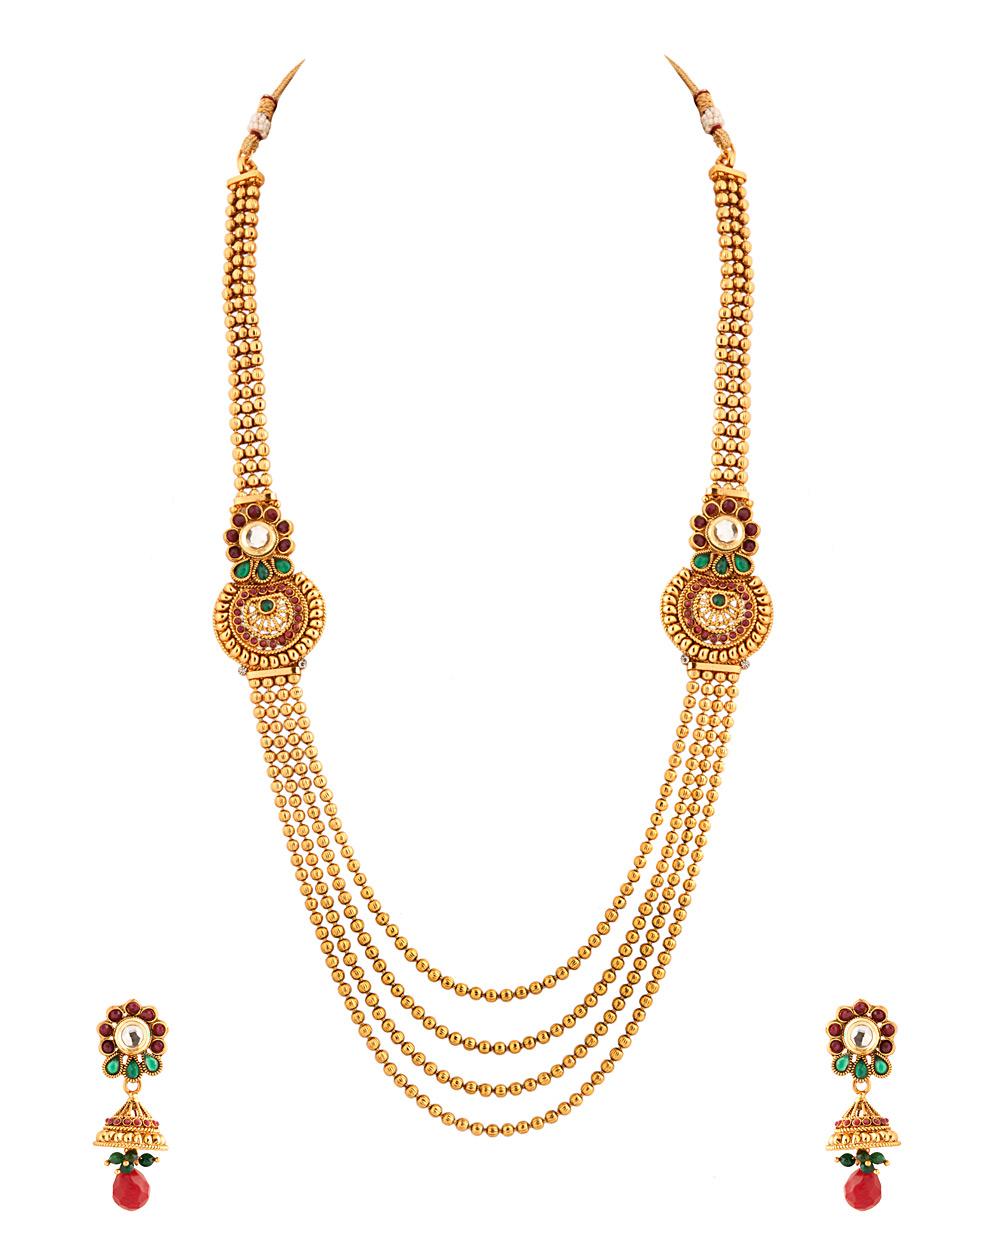 Buy Rani Haar With Paisley Shaped Decorations Online India | Voylla